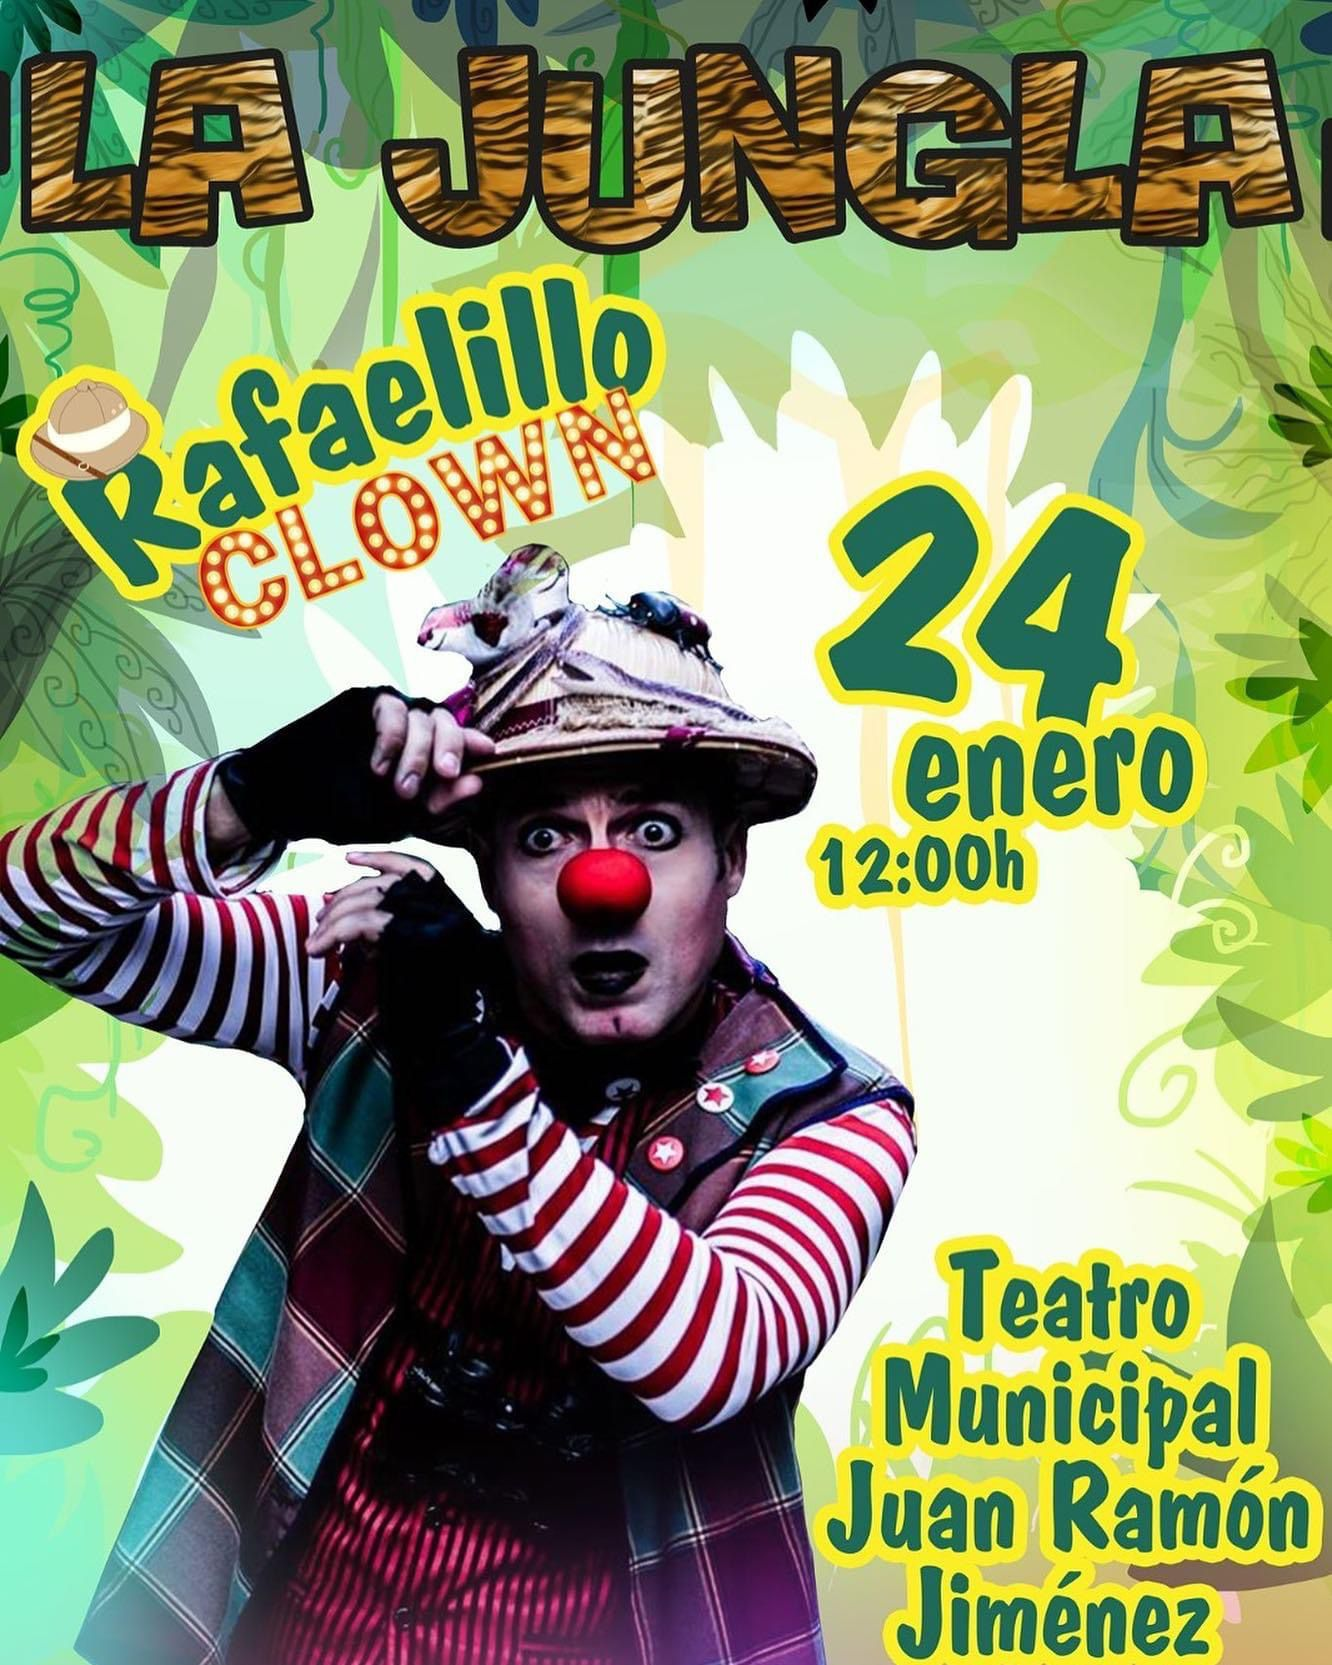 Rafaelillo Clown. Telde. Teatro Juan Ramón Jiménez/ canariasnoticias.es